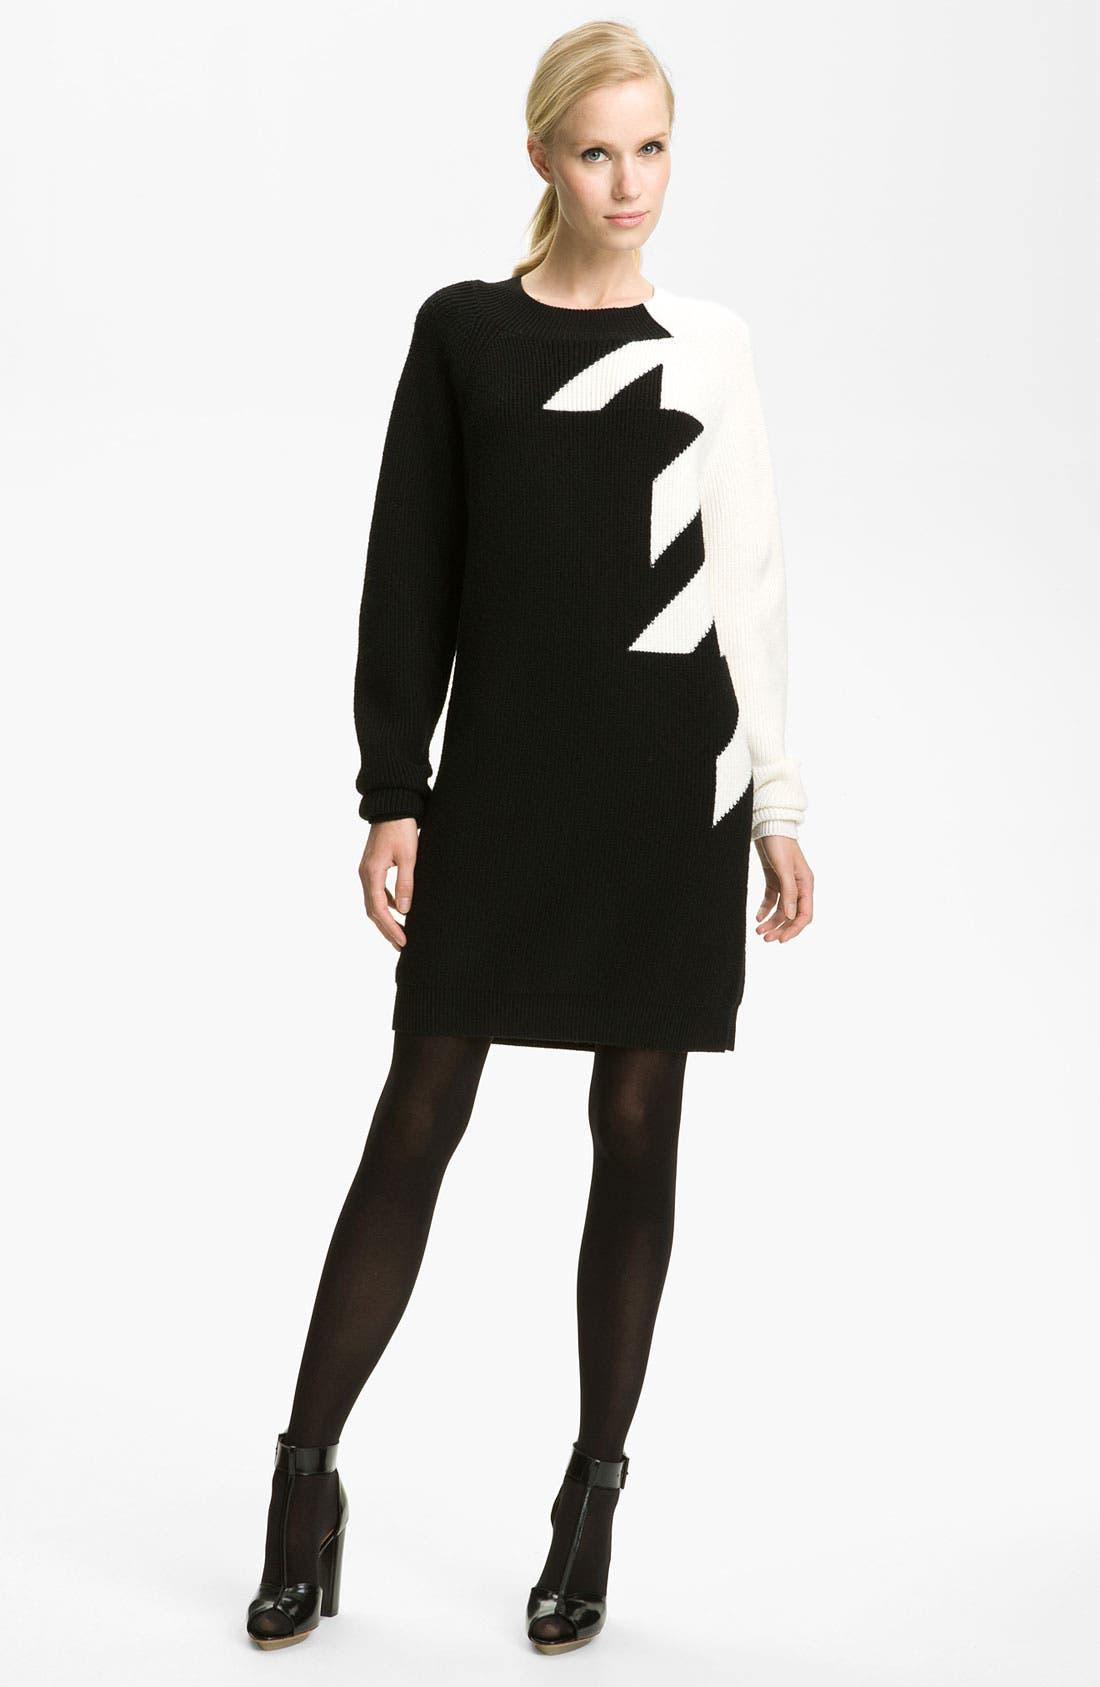 Main Image - 3.1 Phillip Lim Houndstooth Knit Dress